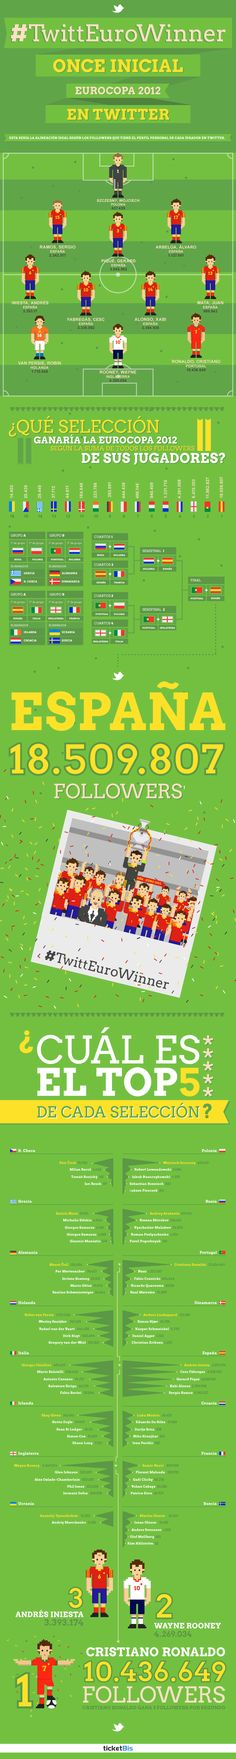 España gana la Eurocopa 2012 en Twitter (antes de jugarla) #infografia #infographic #socialmedia